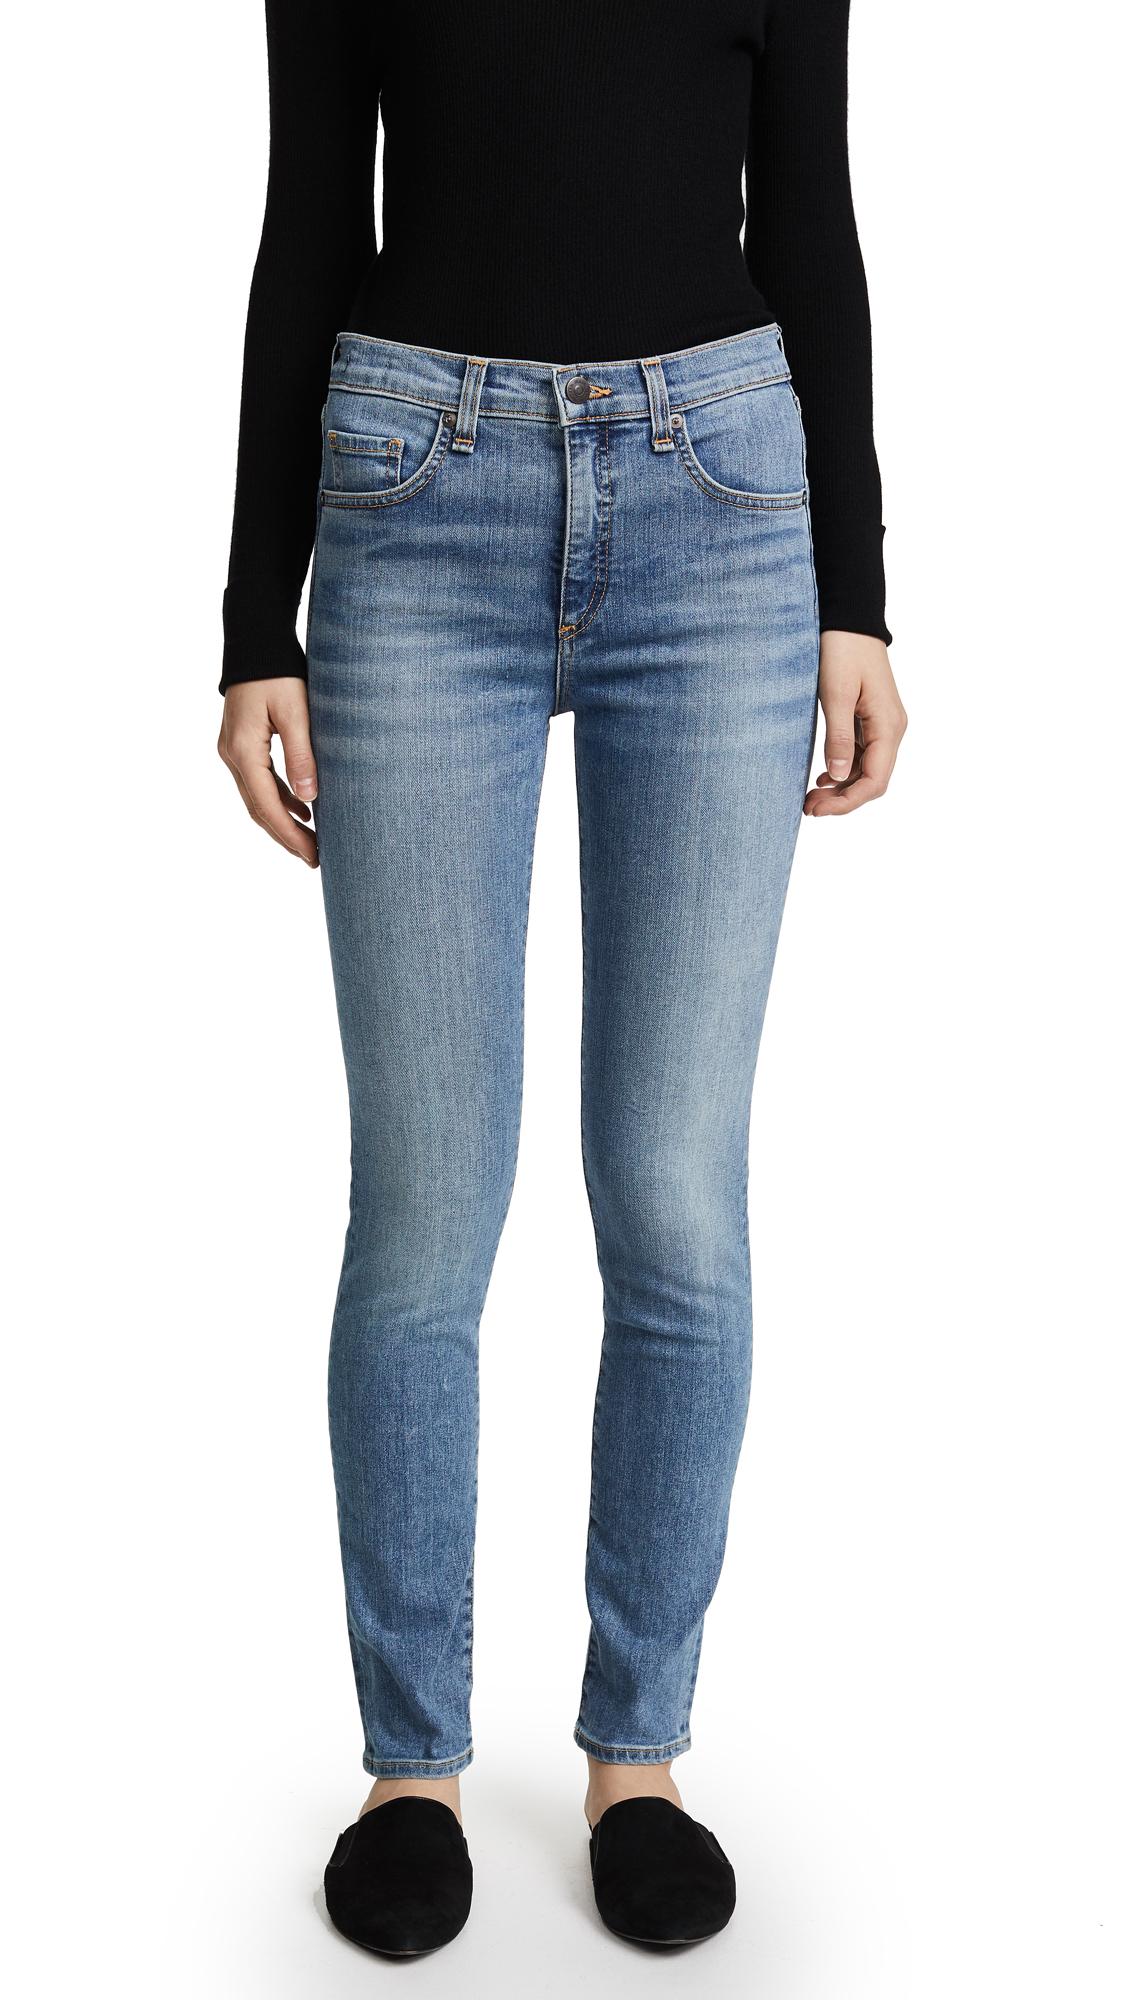 Veronica Beard Jean Kate Skinny Jeans - Retro Blue